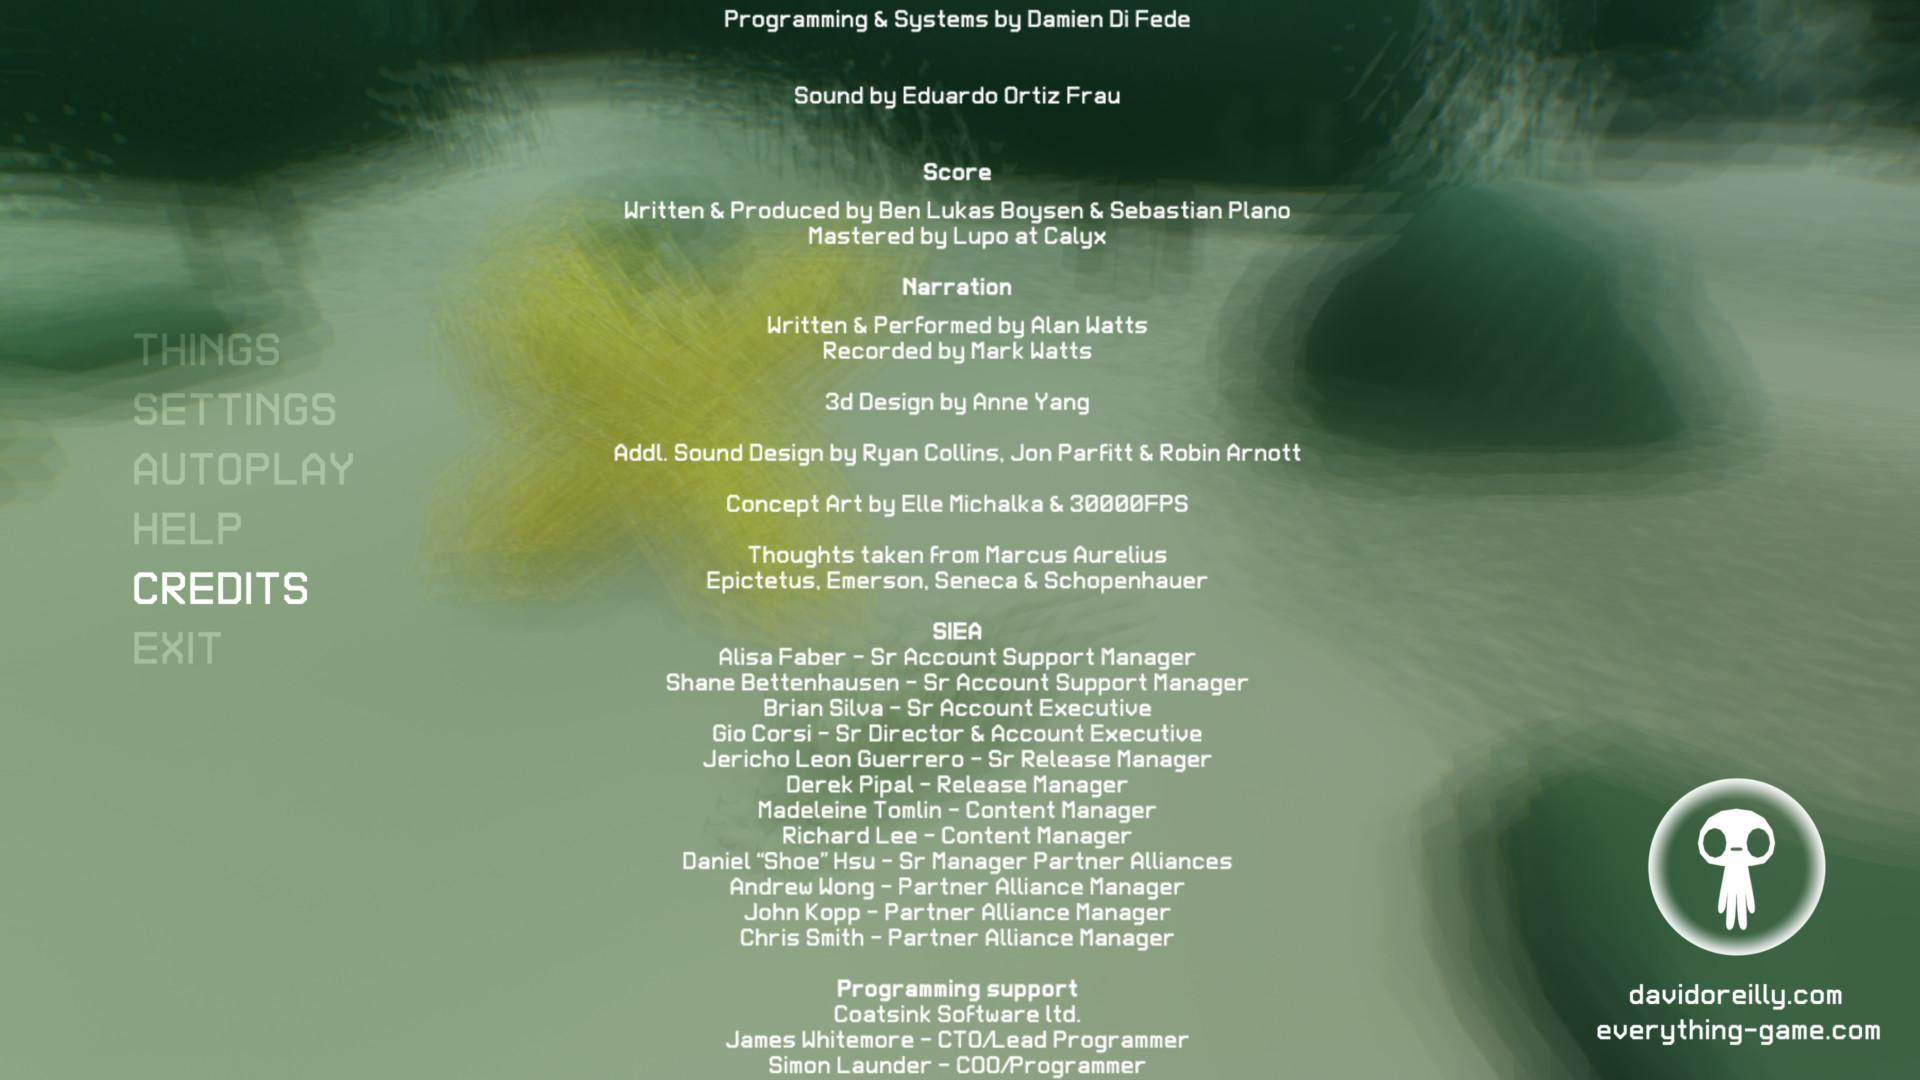 everything-credits